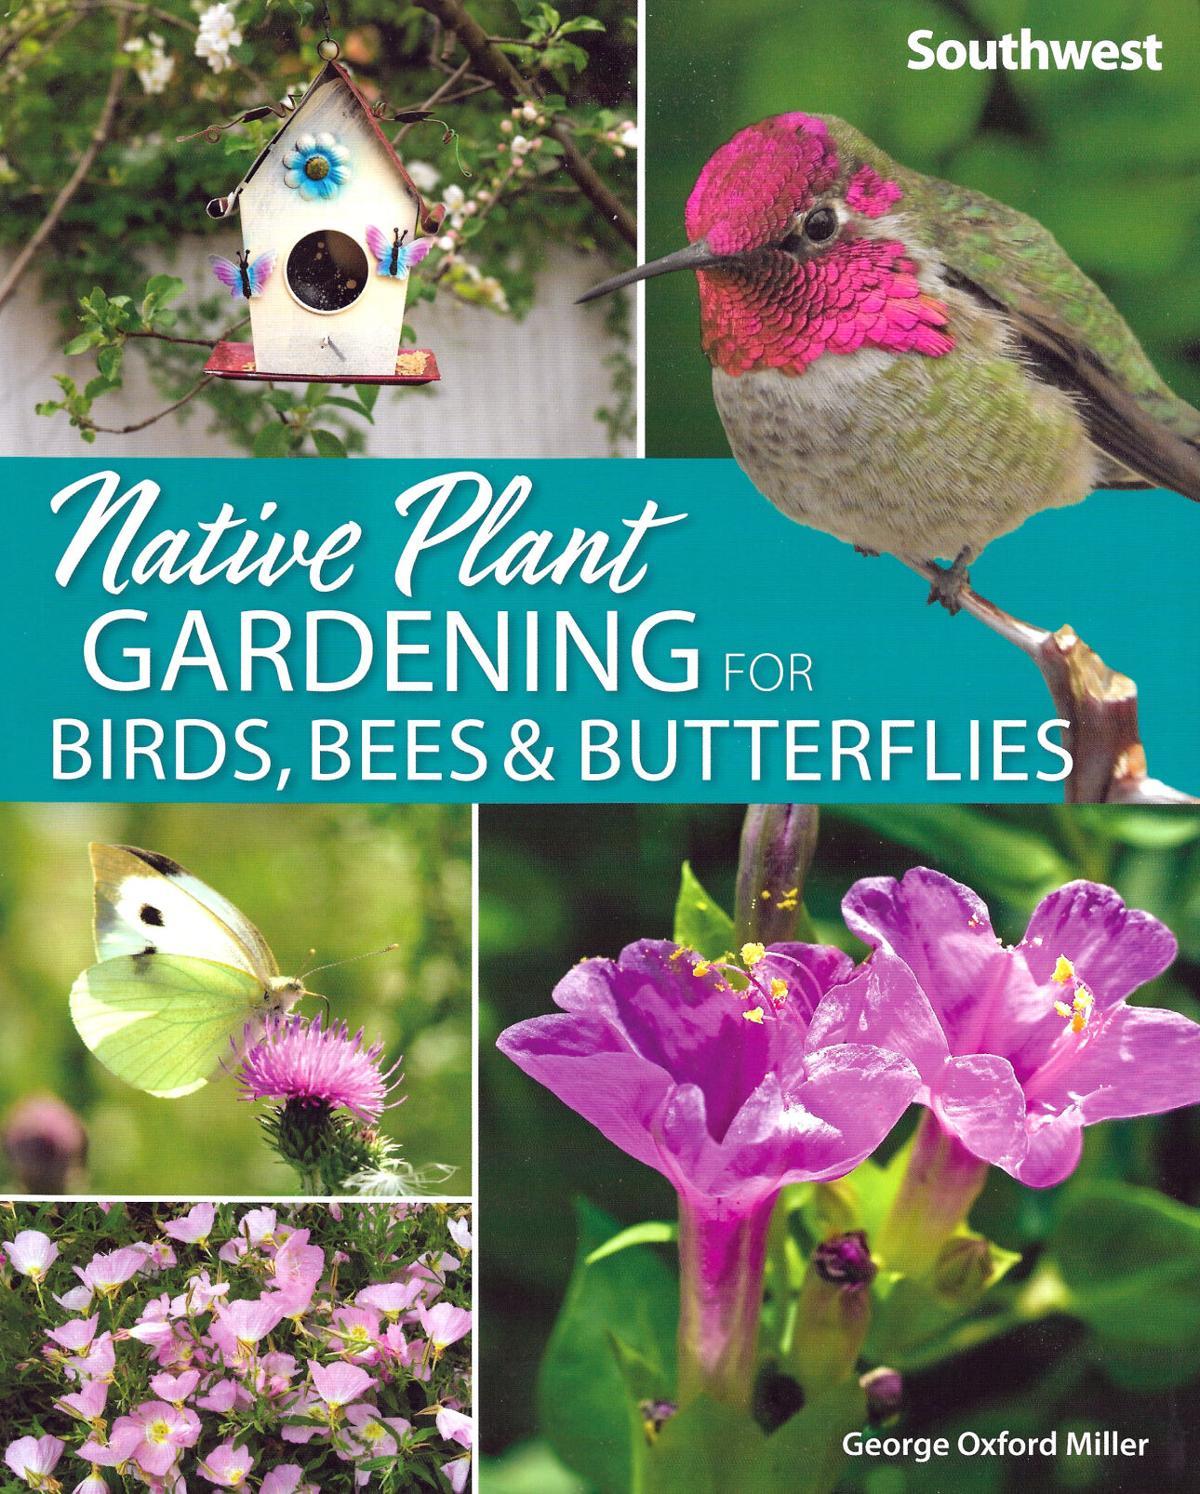 SW Pollinator Gardening-cover.jpg